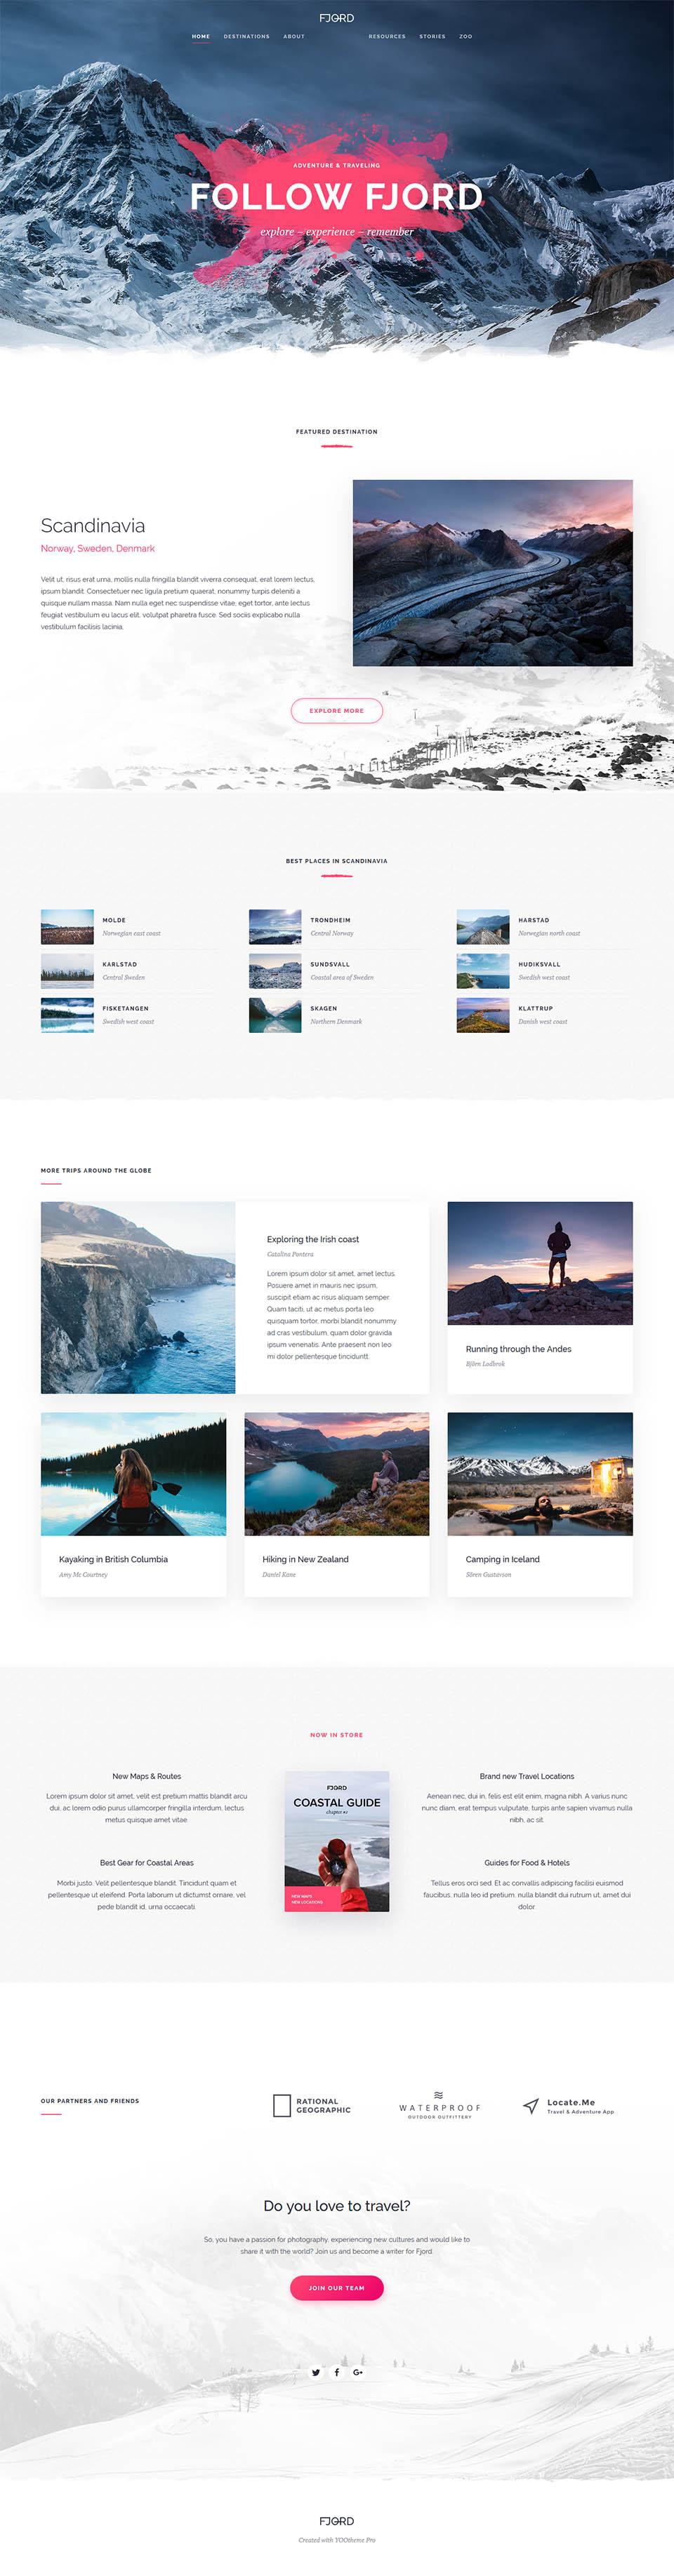 fjord_big.jpg